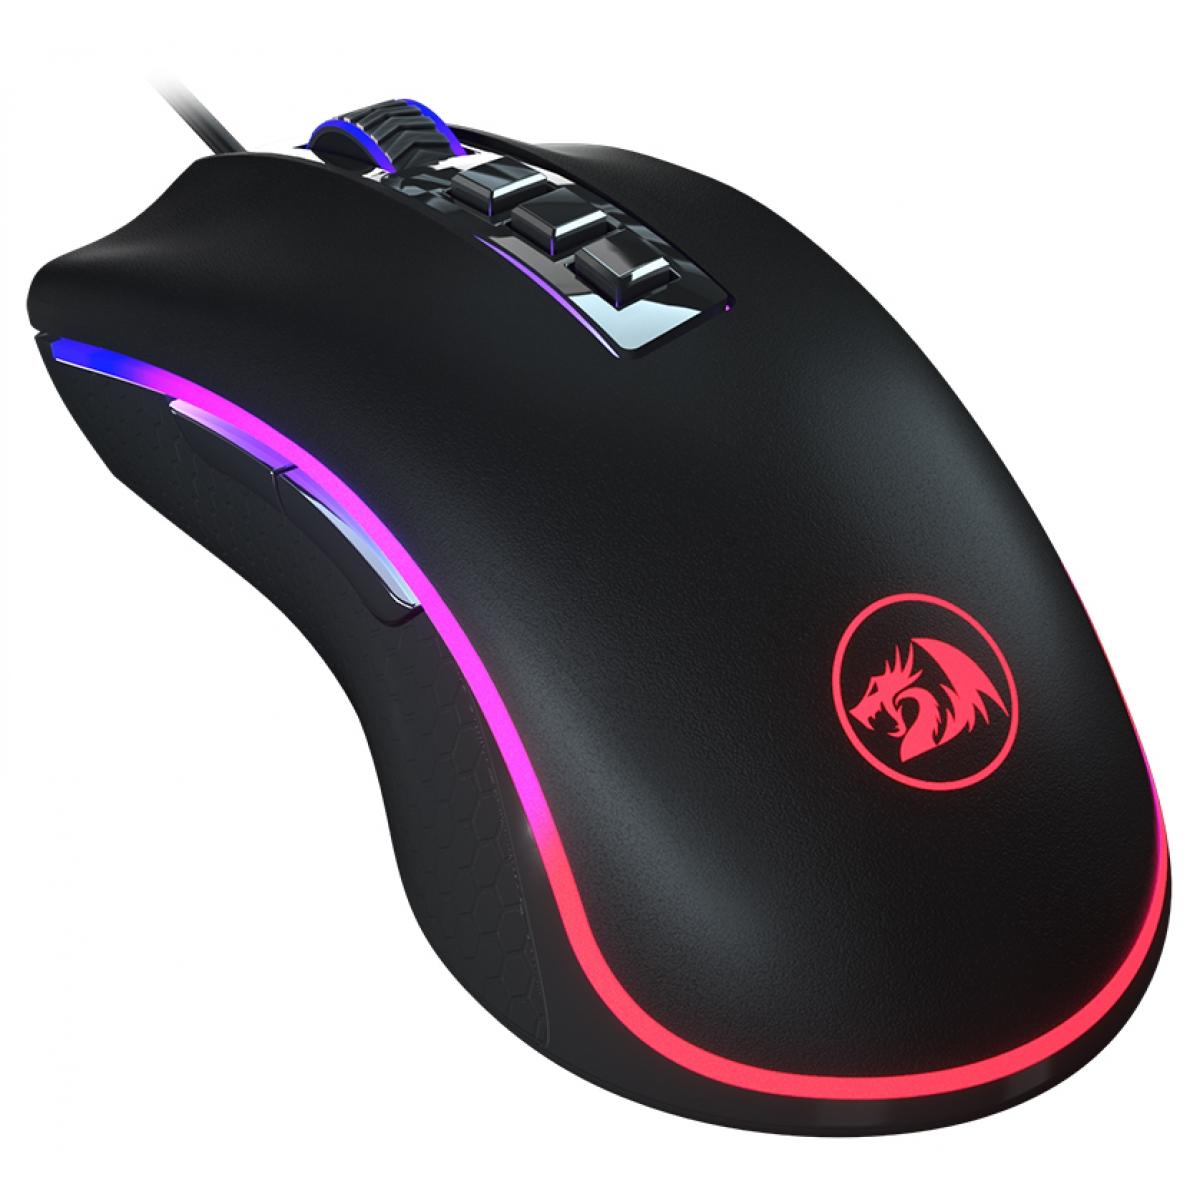 Mouse Gamer Redragon King Cobra Chroma RGB, 24000 DPI, 7 Botões Programáveis, Black, M711-FPS-1